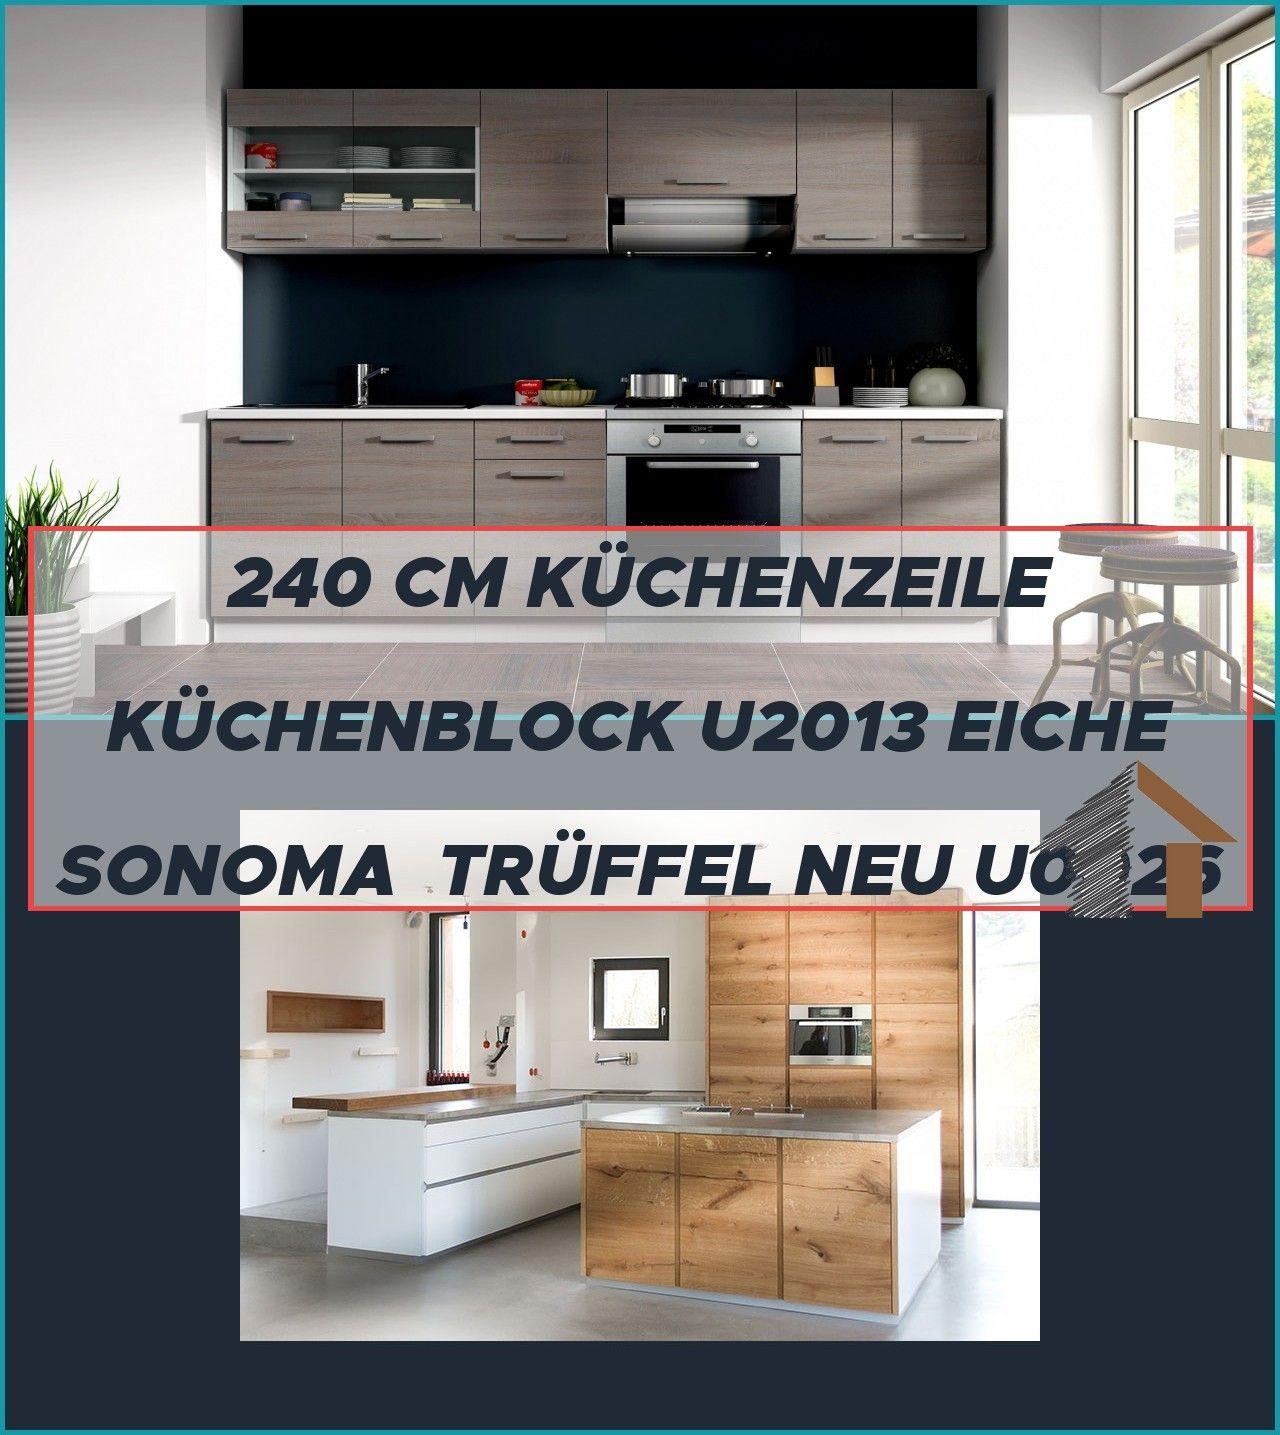 Details Zu Top Kuche Dave 240 Cm Kuchenzeile Kuchenblock U2013 Eiche Sonoma Truffel Neu U0026 Ovp Eiche Holz Modern Weiss Che Kuche B In 2020 Kuche Block Kuche Holz